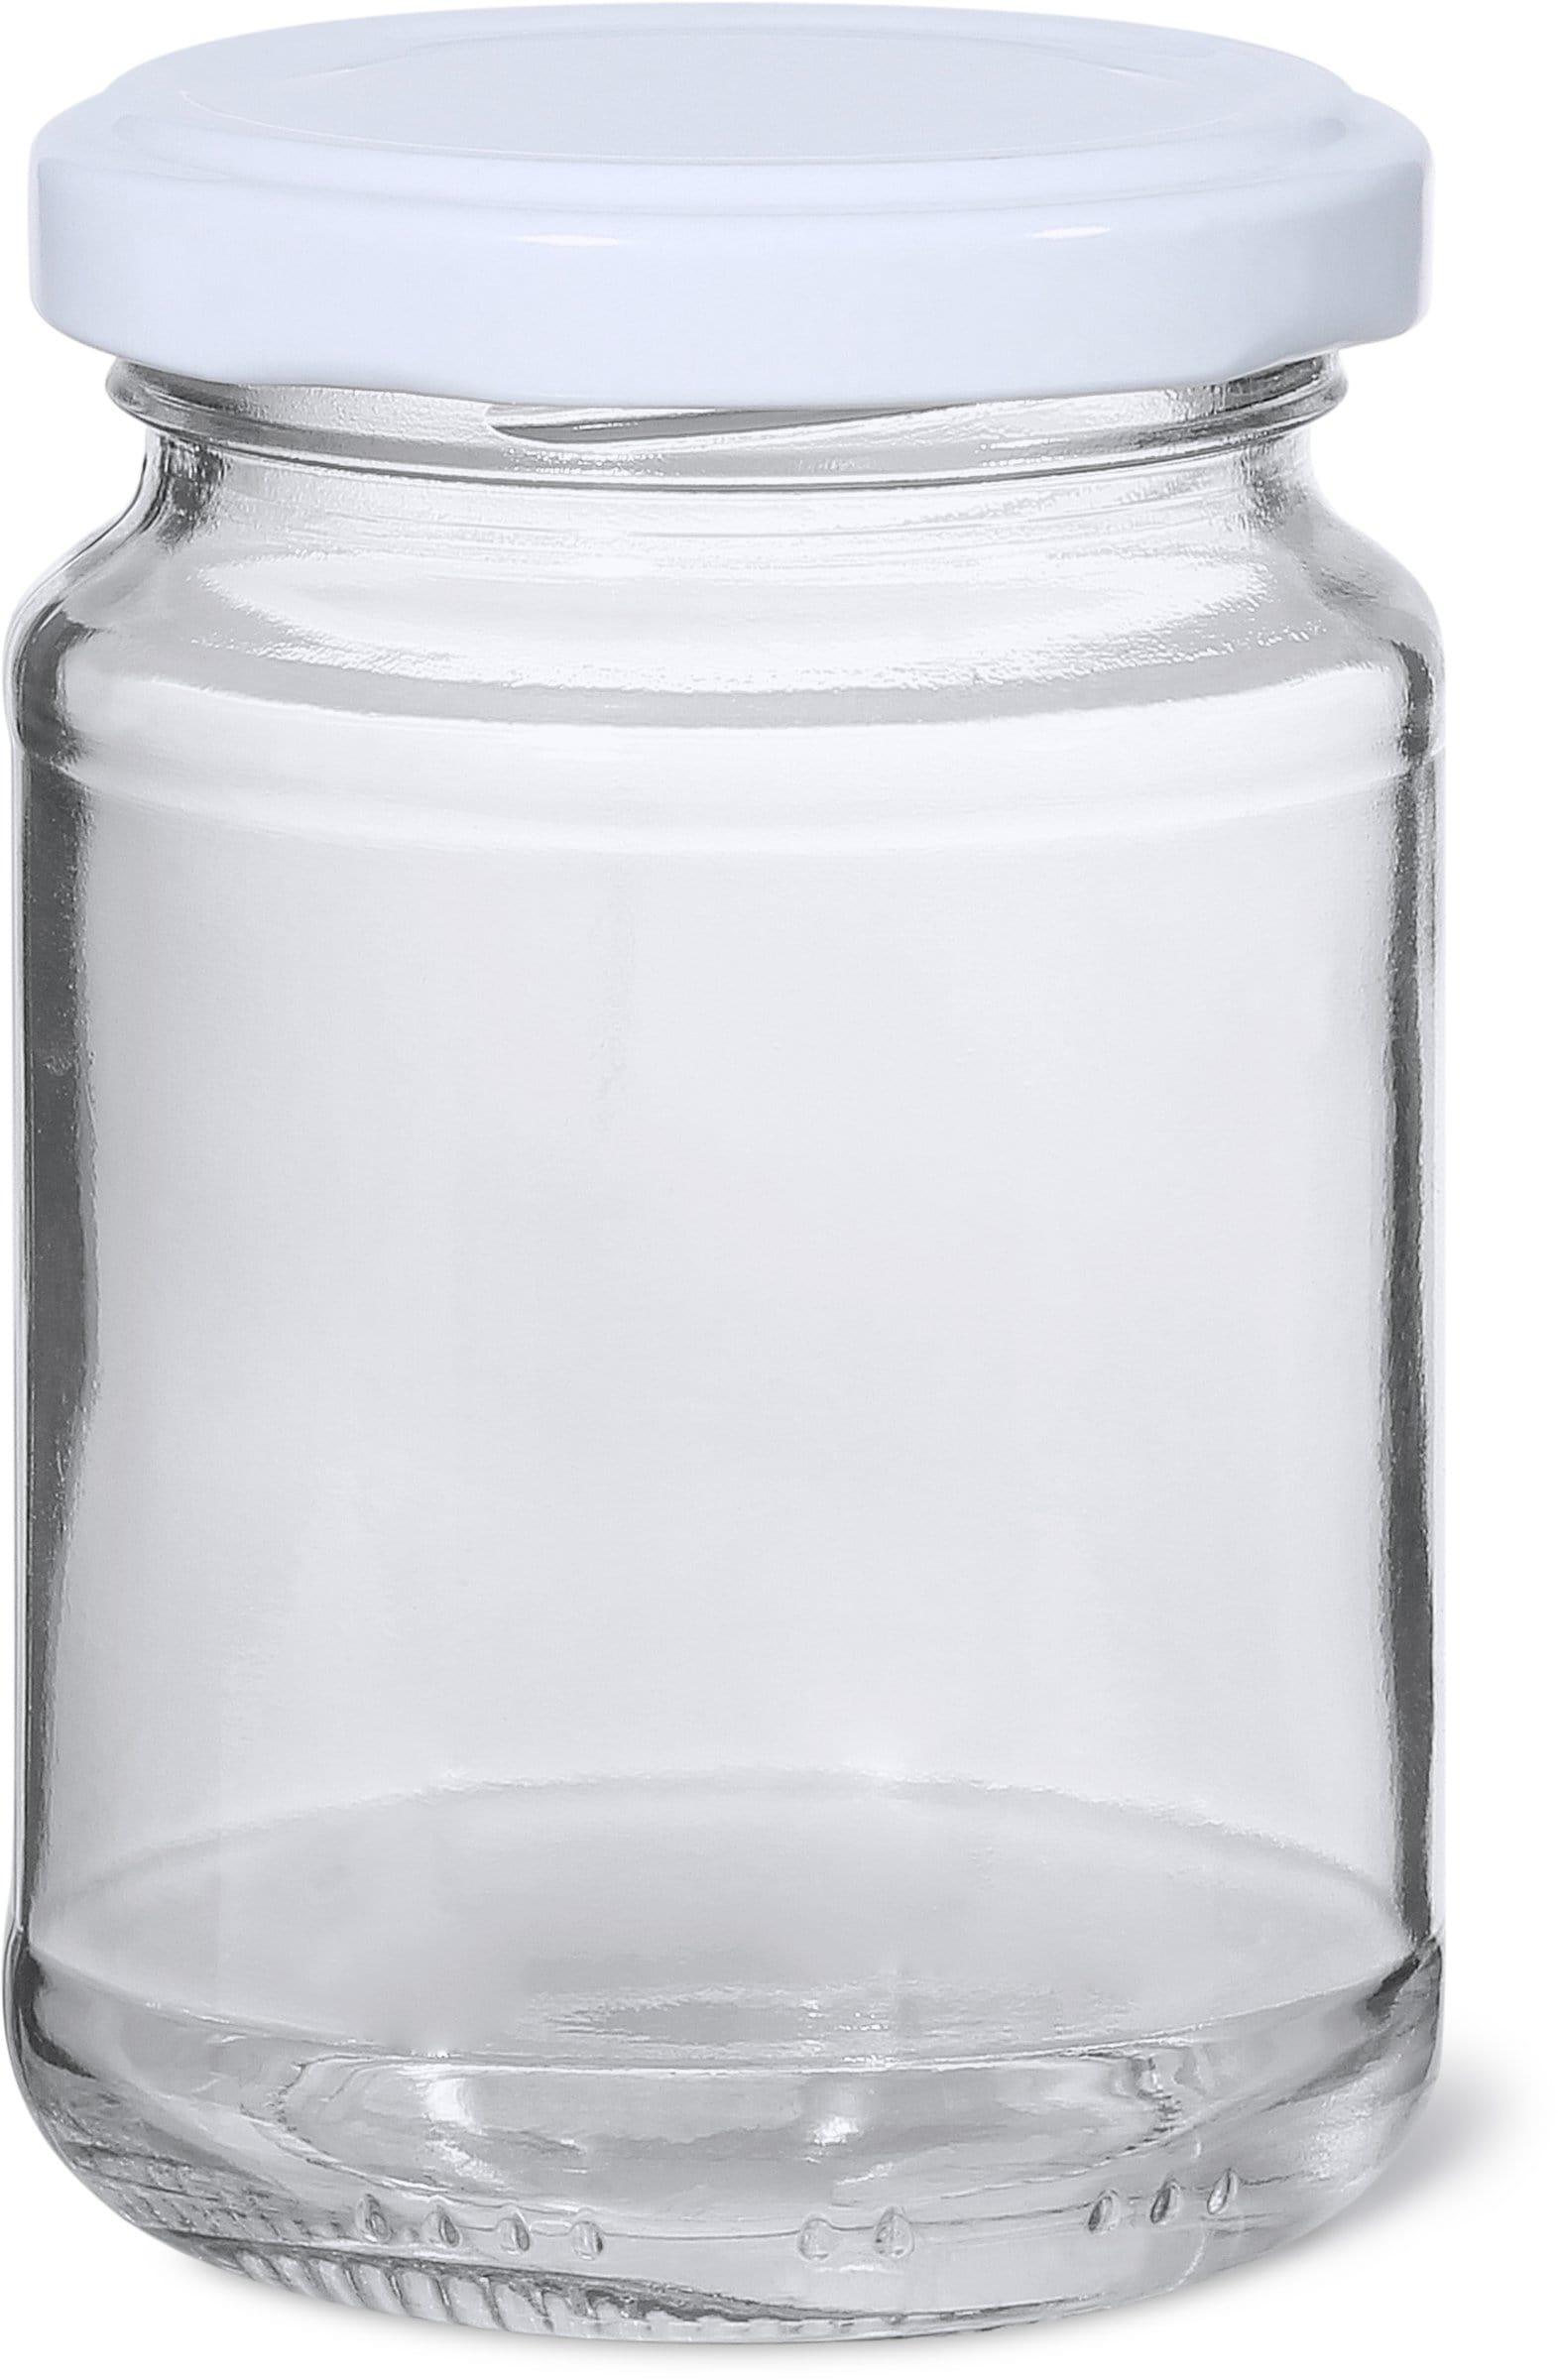 Cucina & Tavola Honigglas